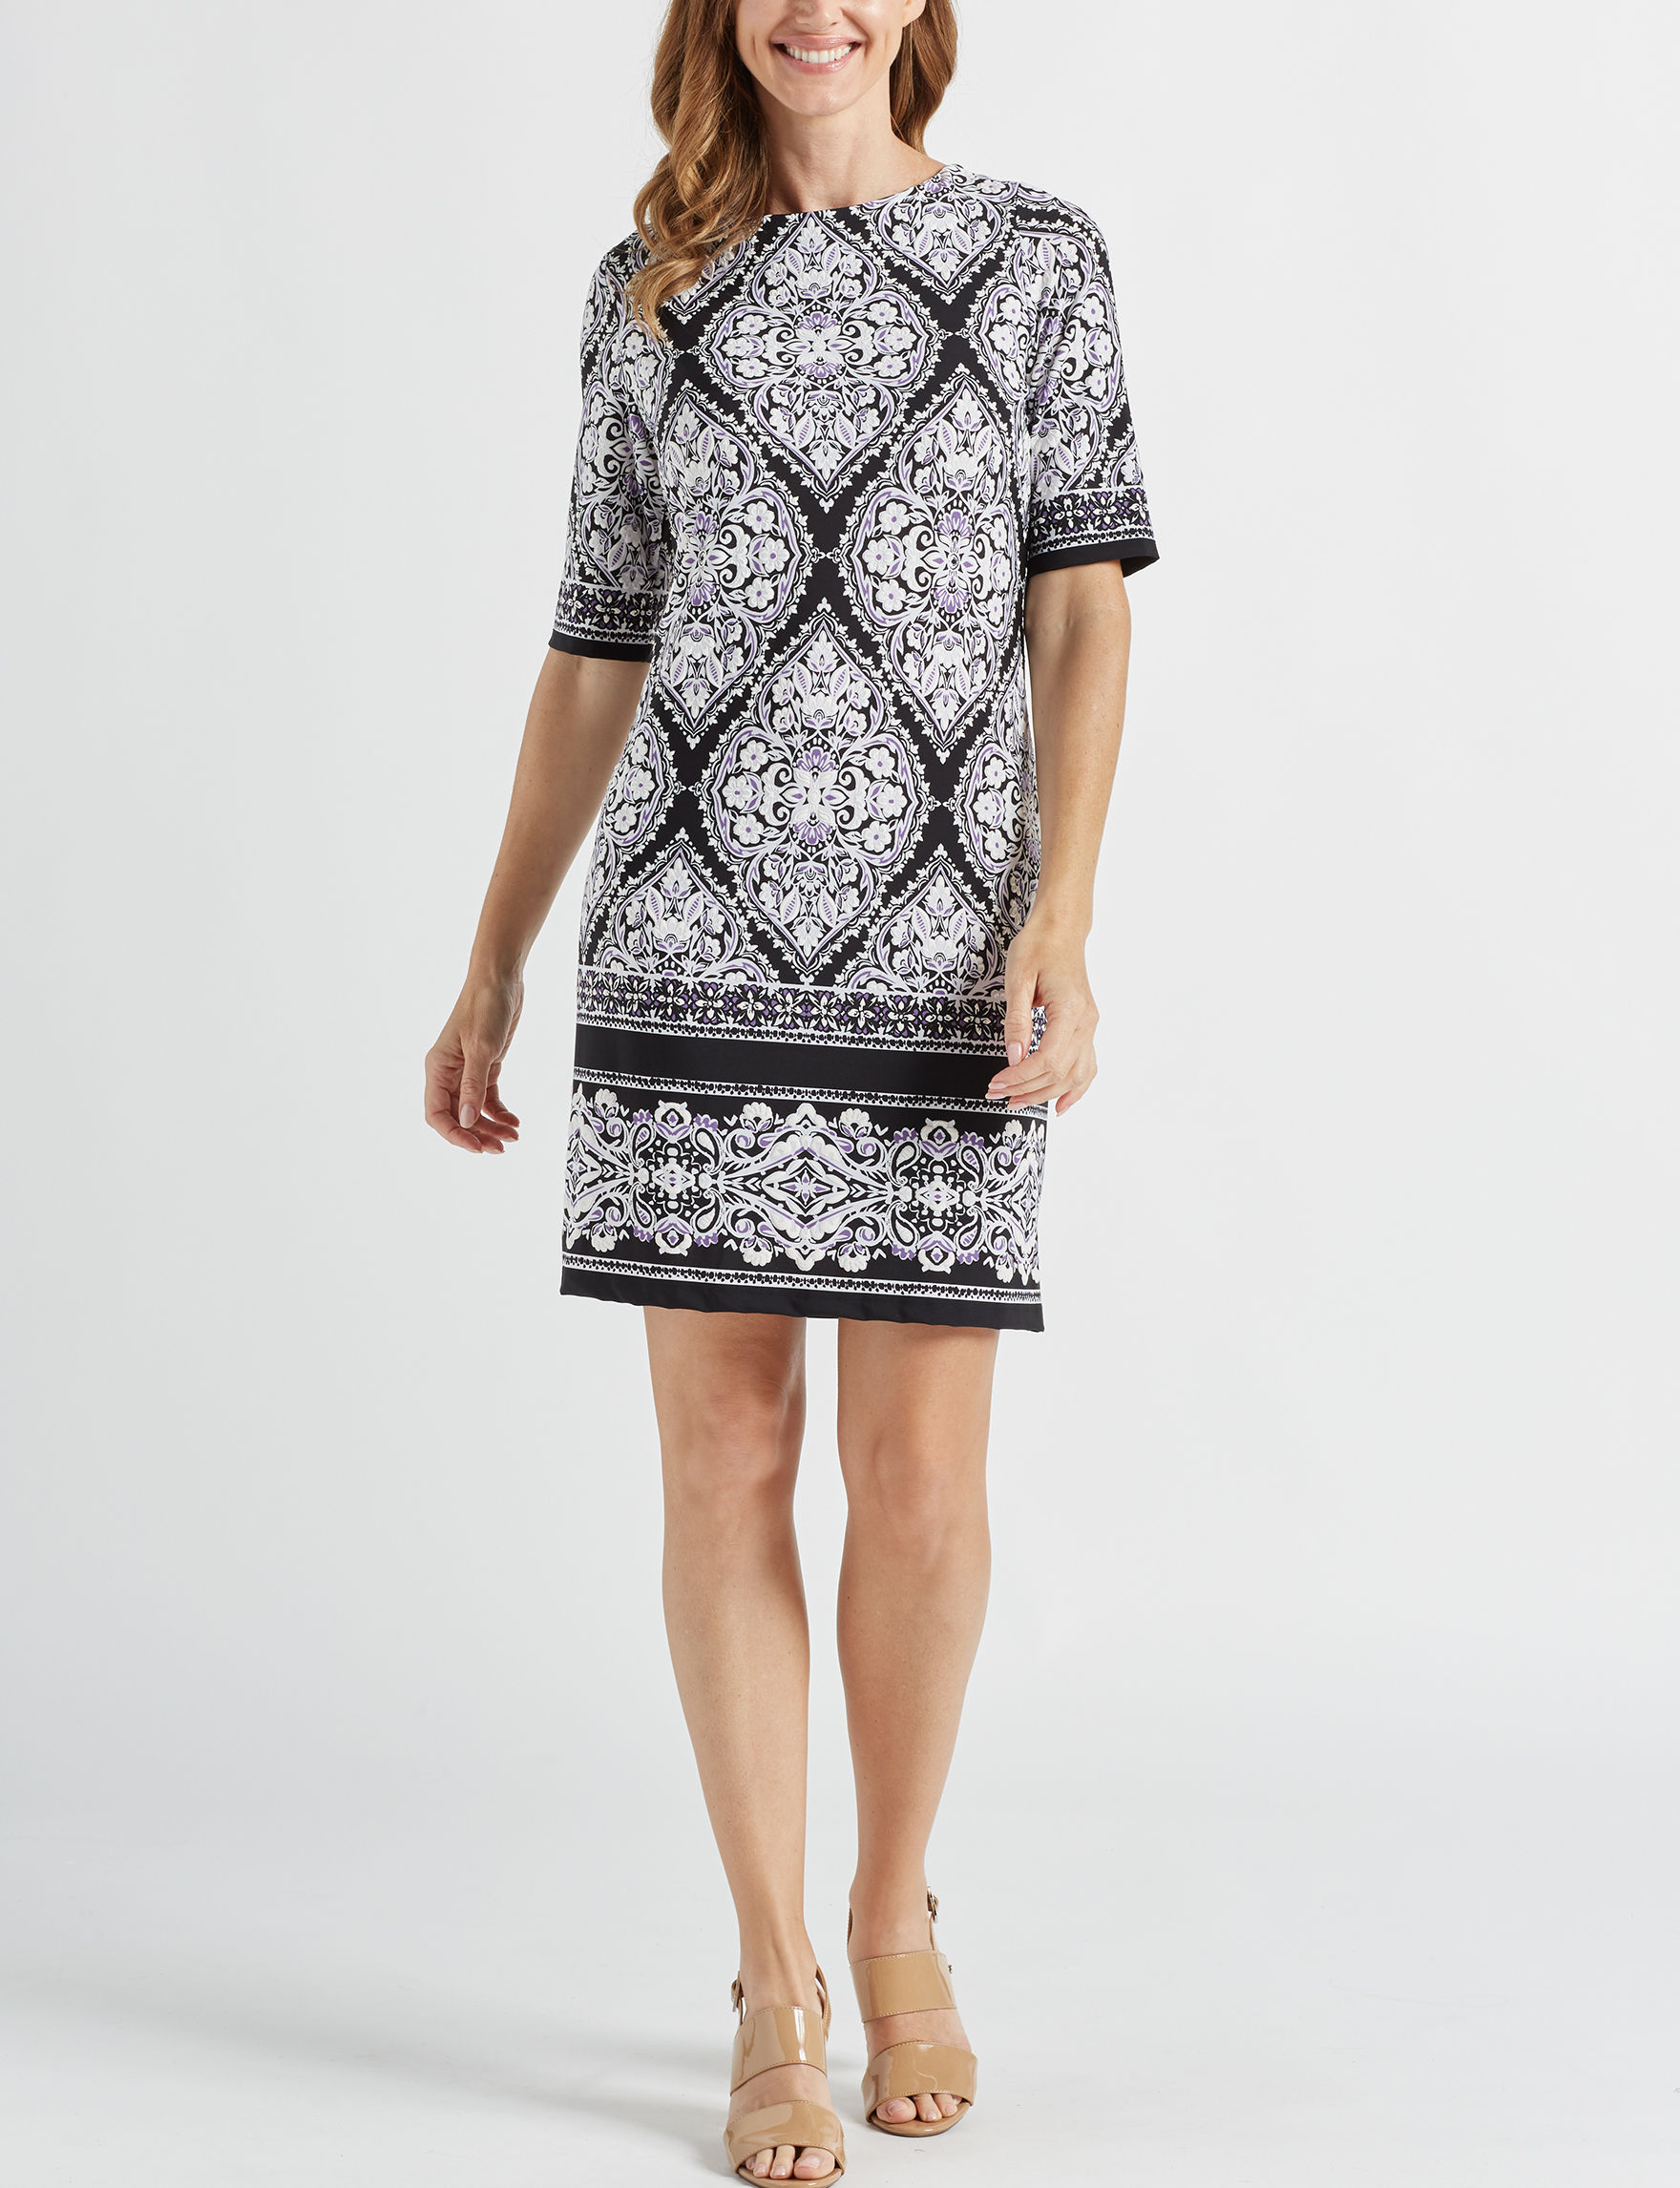 Sandra Darren Black Everyday & Casual Shift Dresses